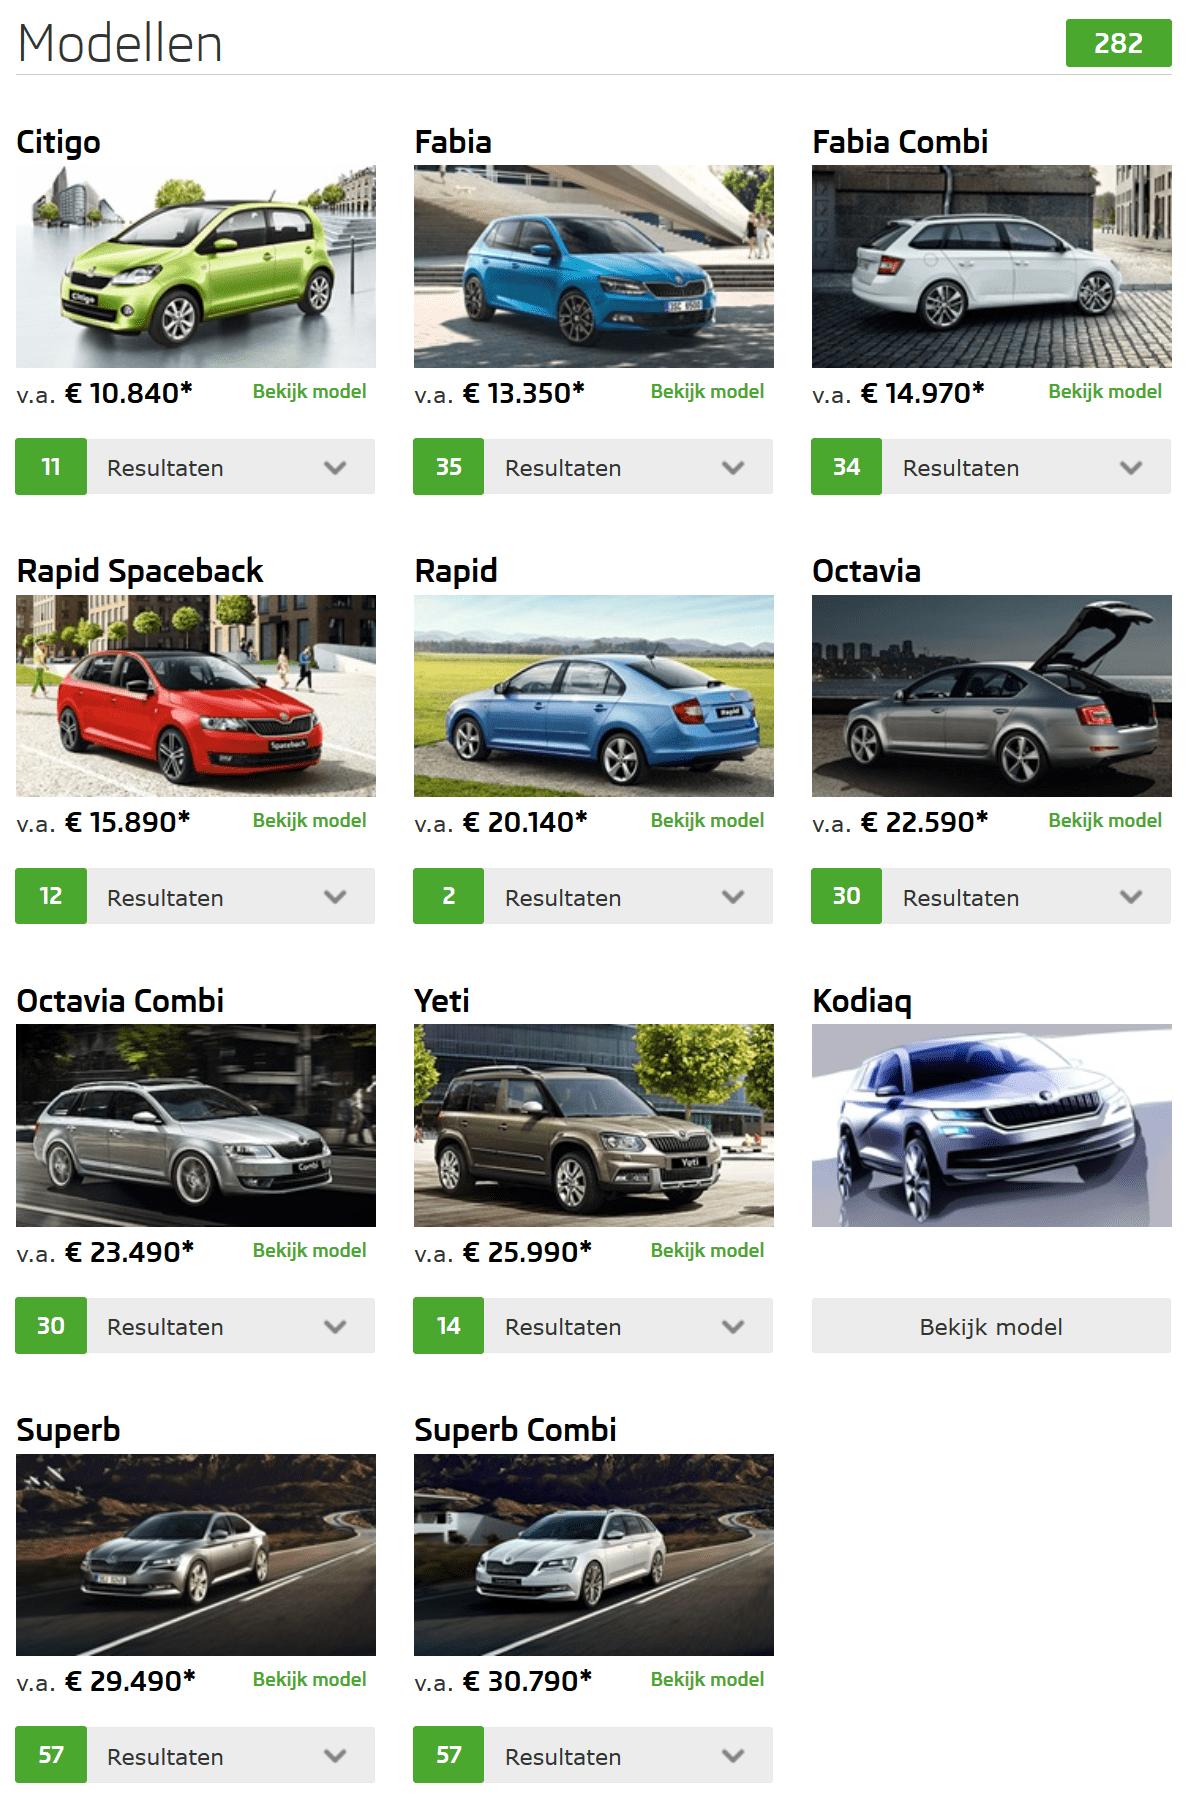 Skoda Modellen 2016 Q3